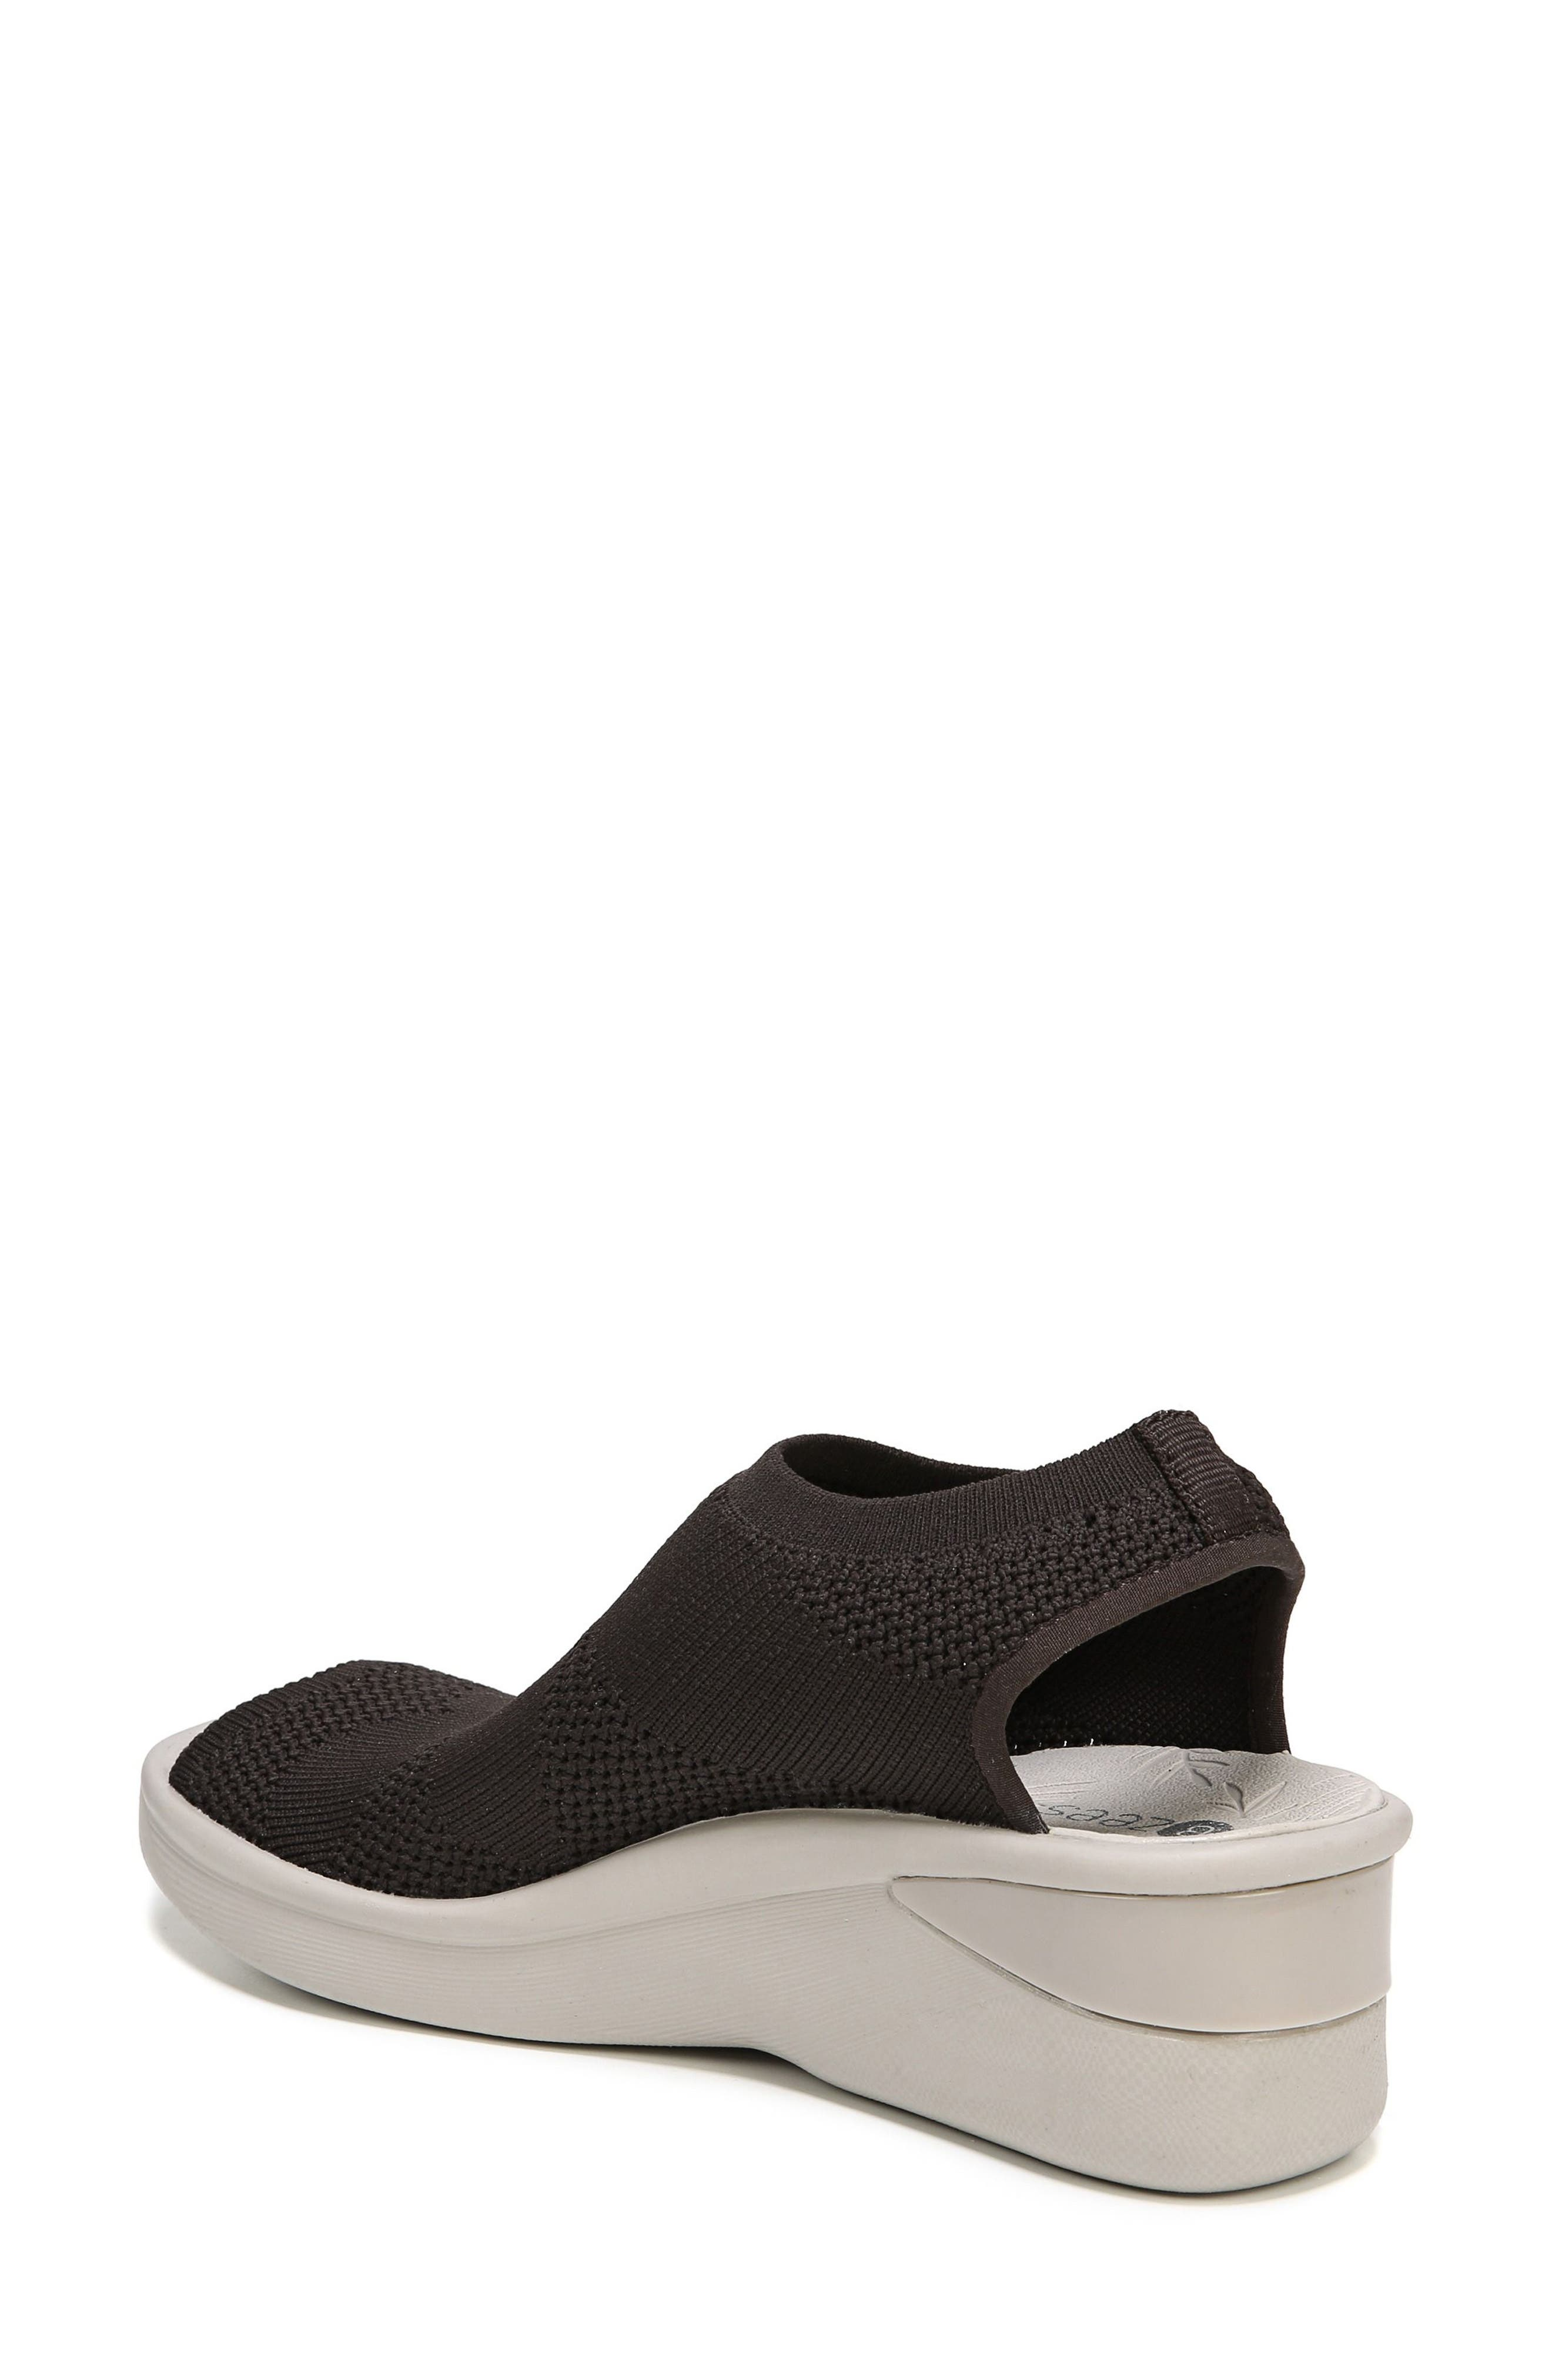 Secret Peep Toe Knit Sneaker,                             Alternate thumbnail 2, color,                             BROWN FABRIC